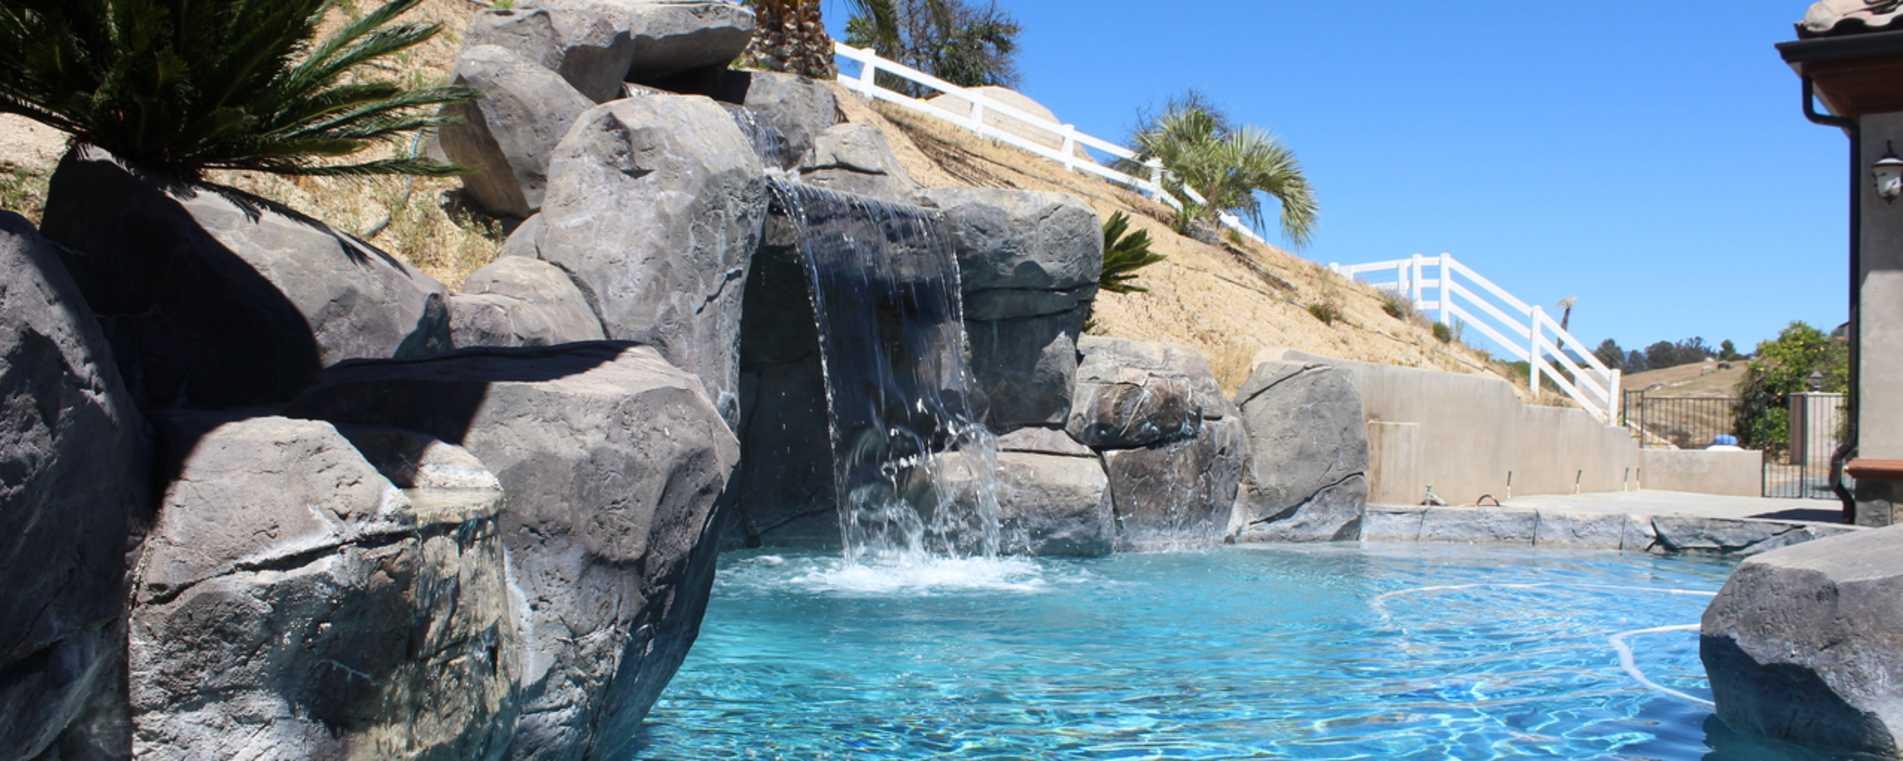 Waterfall - Mediterranean Estate